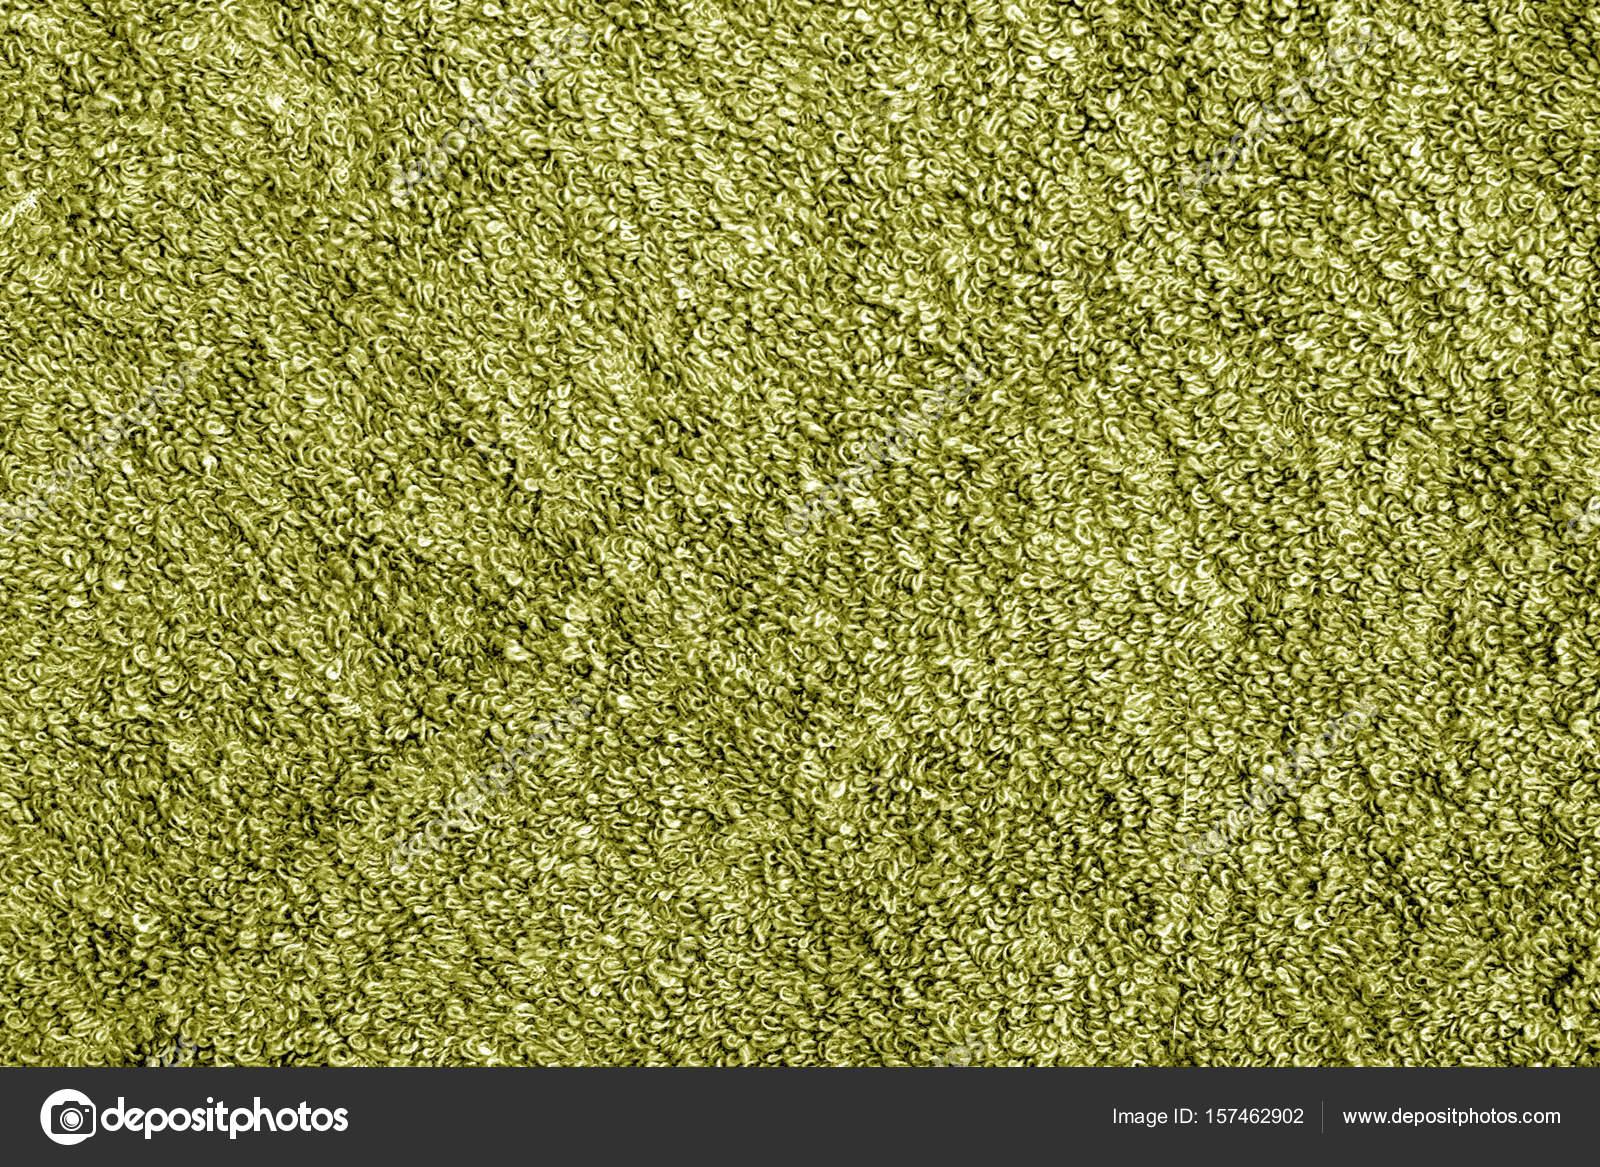 gelbe farbe bad handtuch muster stockfoto - Bad Muster